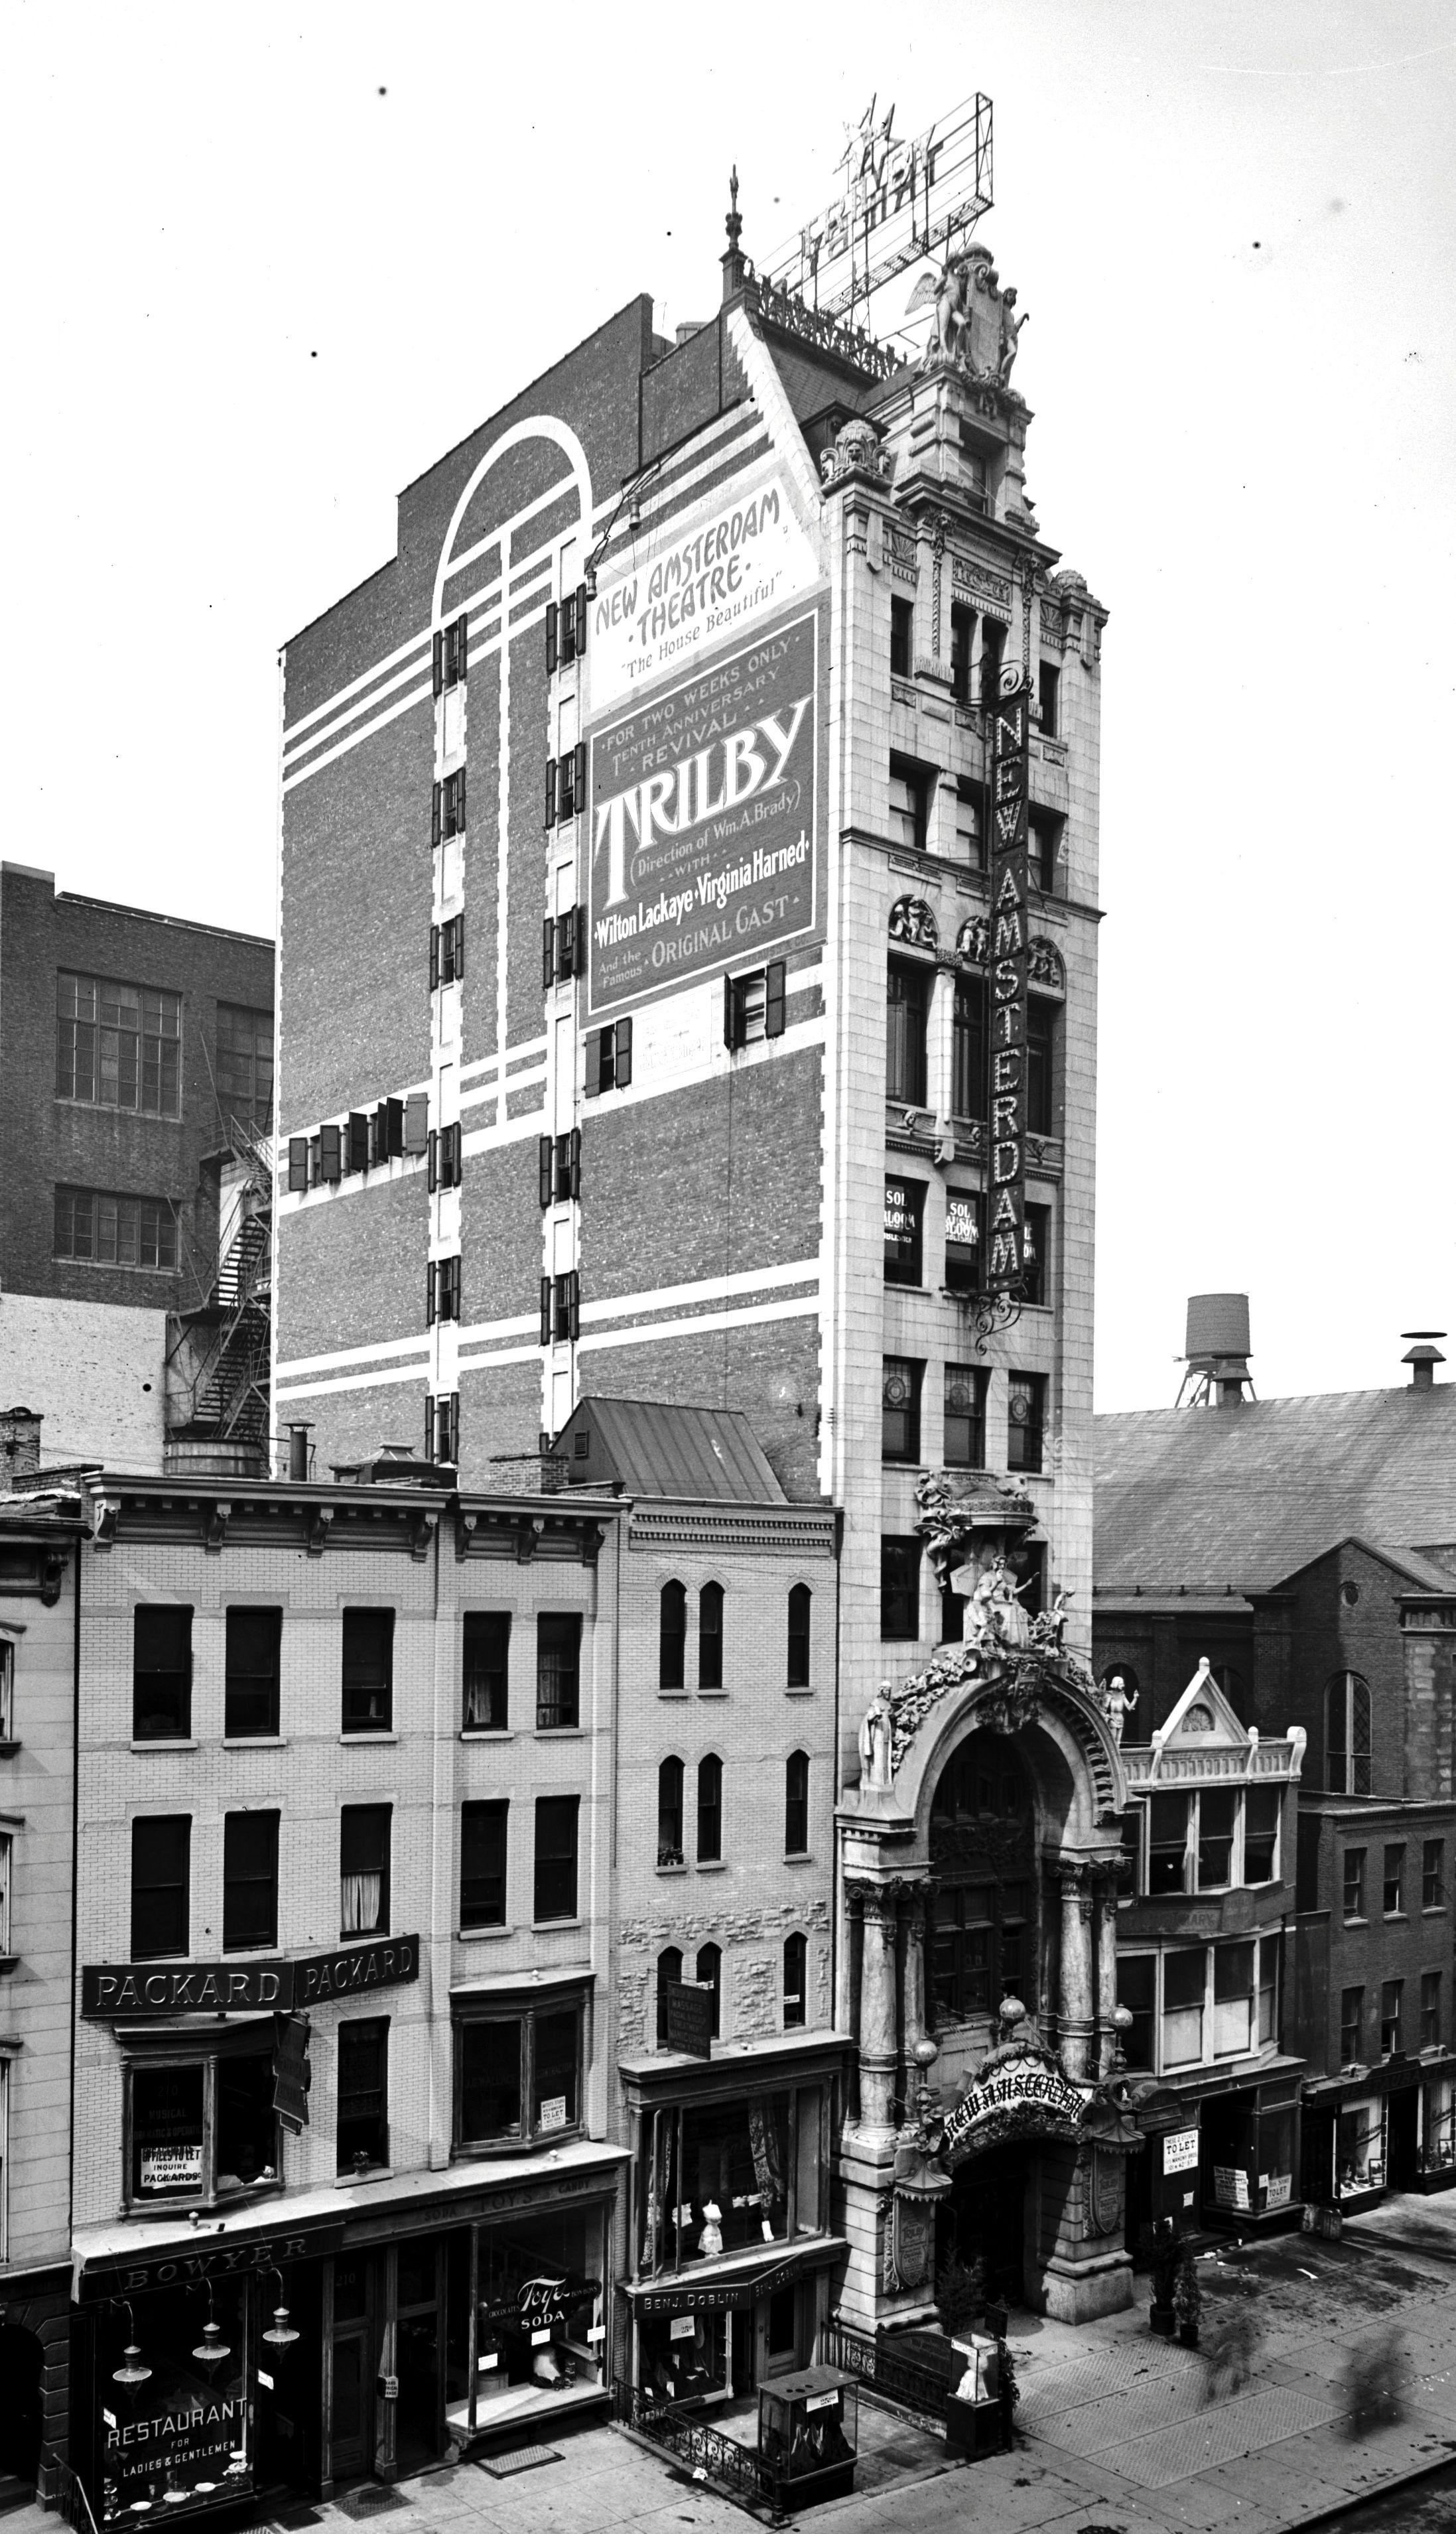 new amsterdam theater 42nd st new york 1905 art nouveau